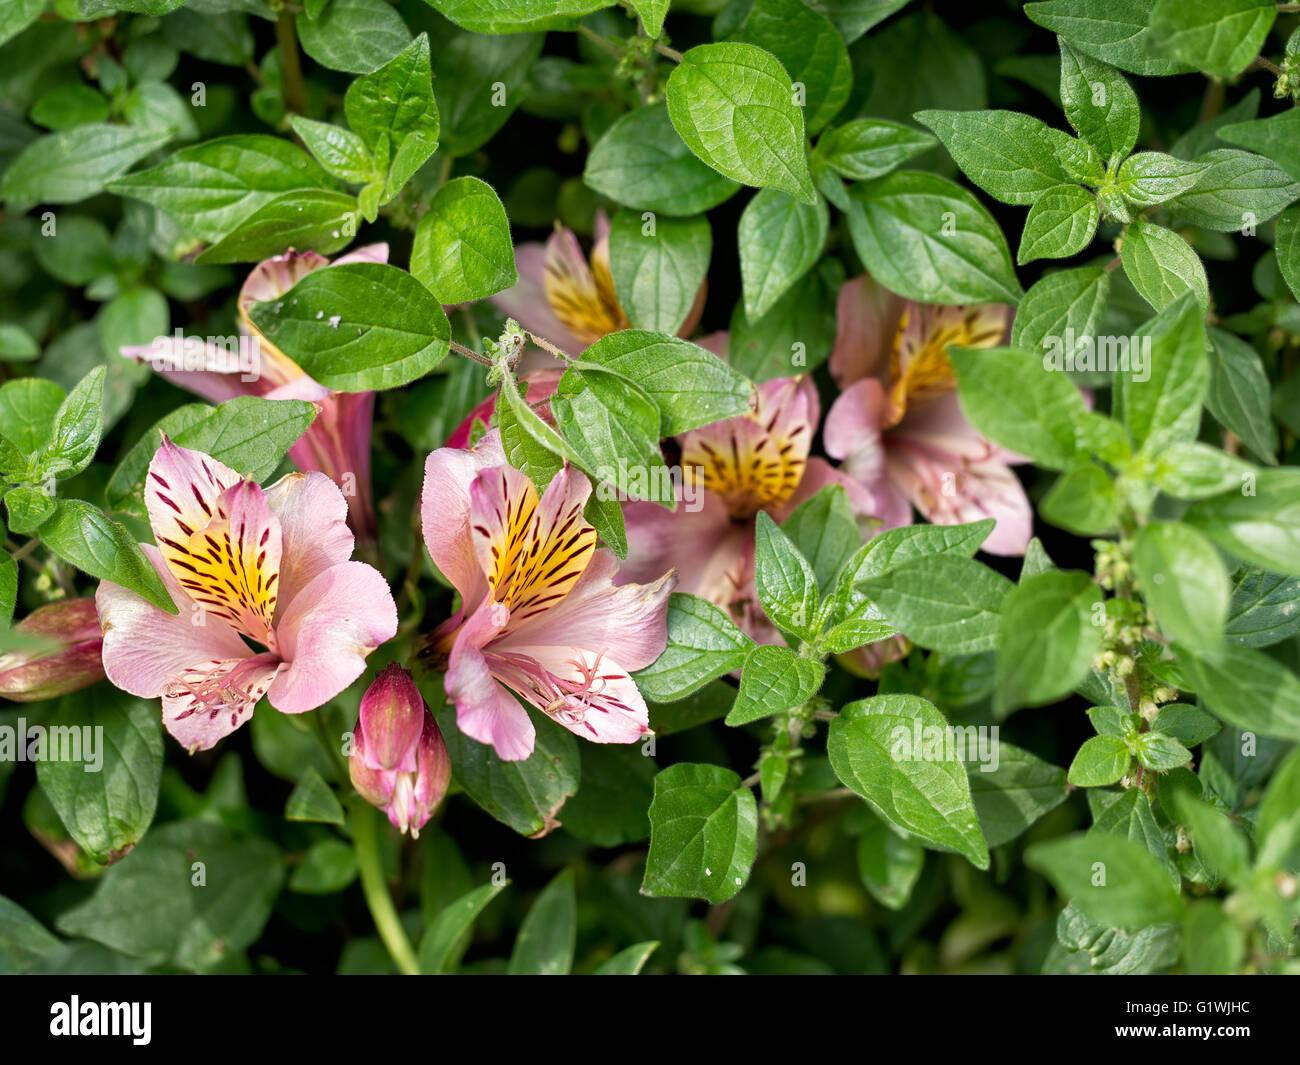 Beautiful survivor in abandoned garden. Alstroemeria amongst weeds - Parietaria officinalis aka pellitory. - Stock Image